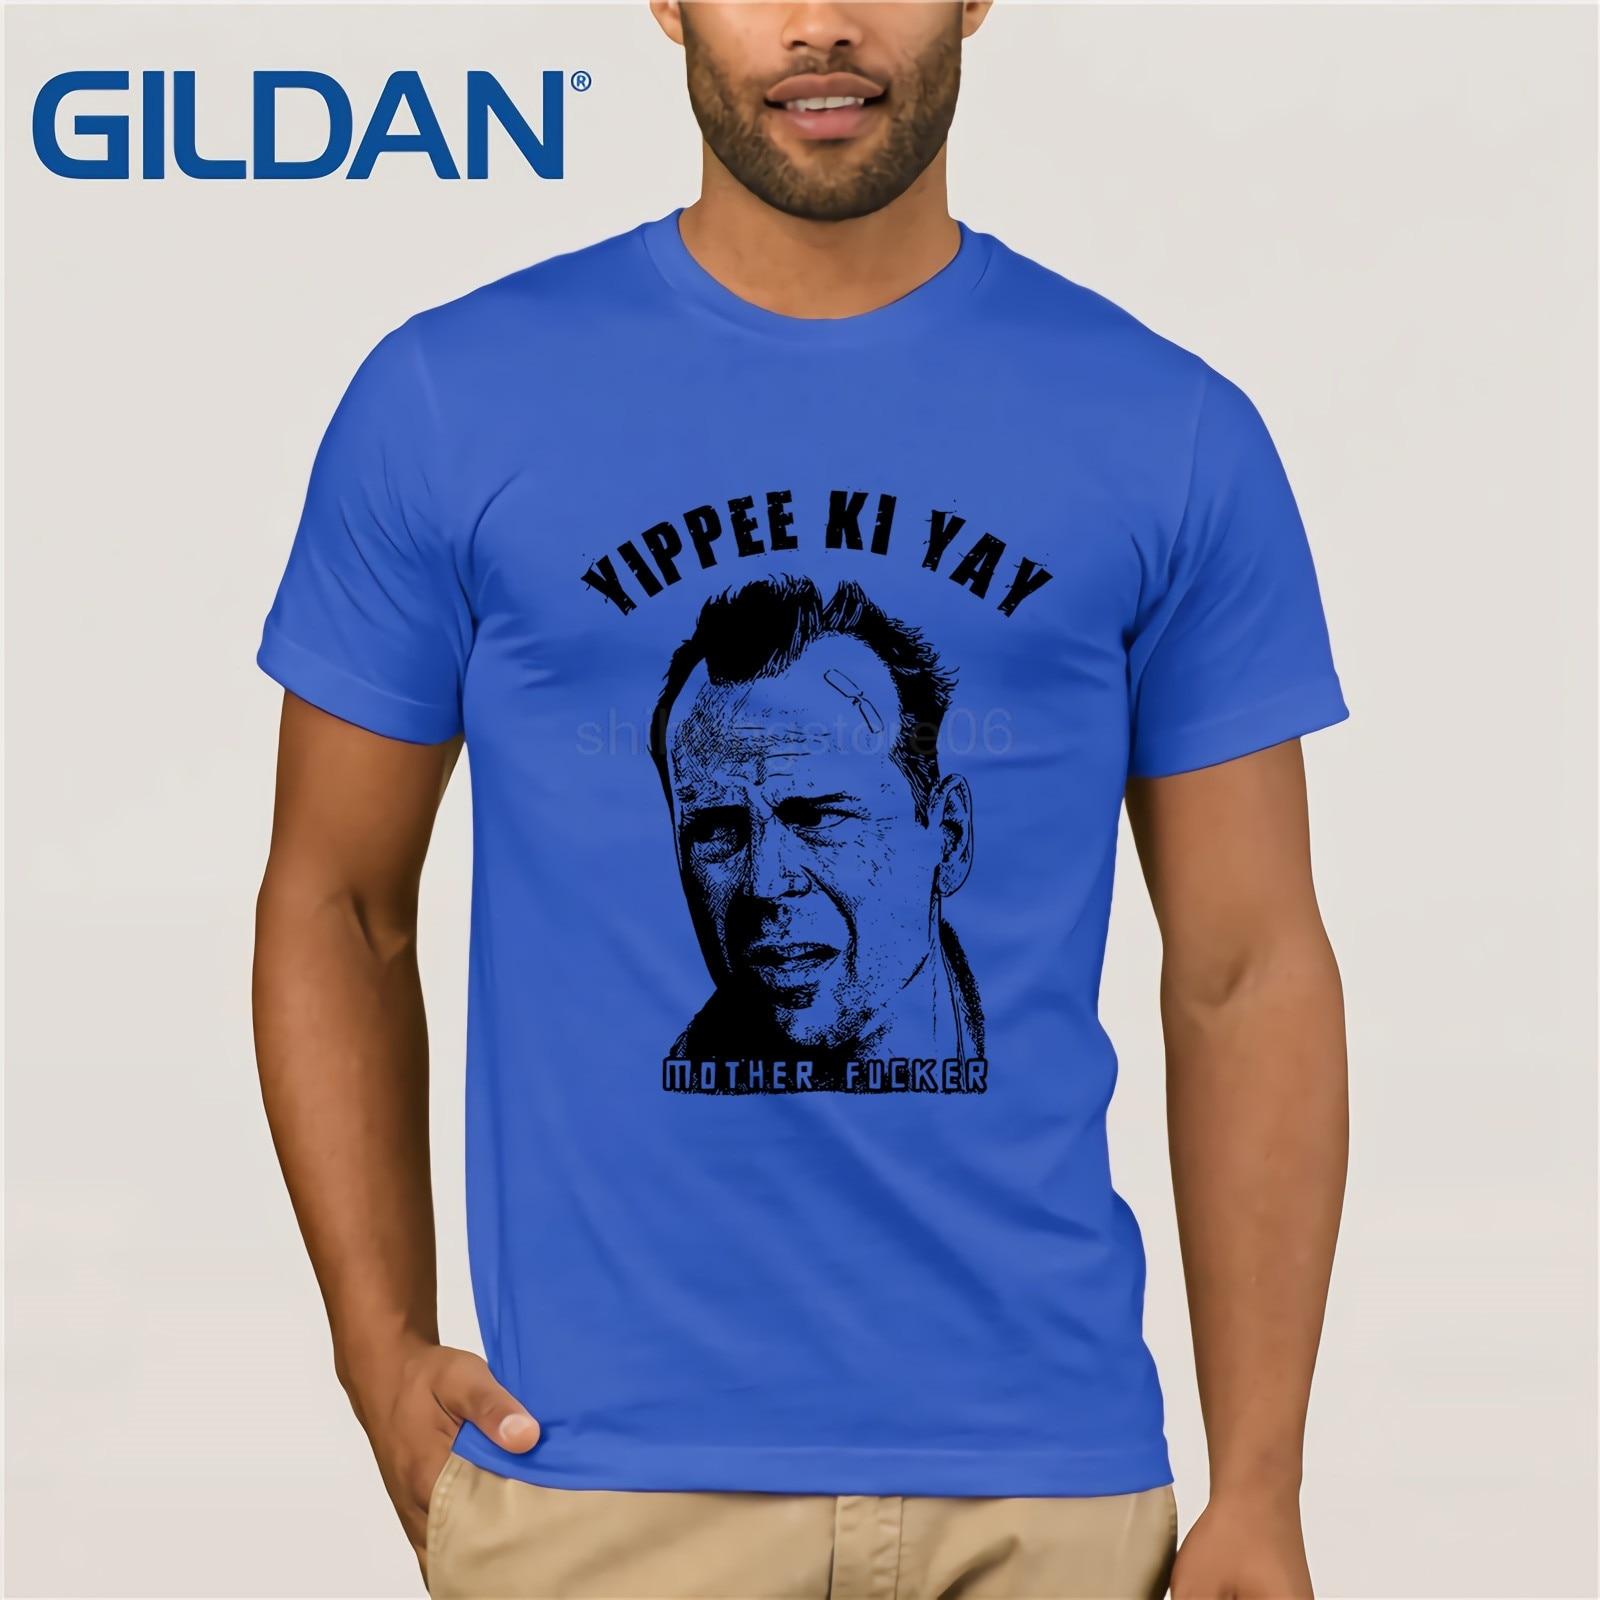 Yippee Ki Yay Mother T Shirt Die Hard Bruce Willis John McClane Movie Tee  Short Sleeves Cotton T-Shirt  Shirts for Men